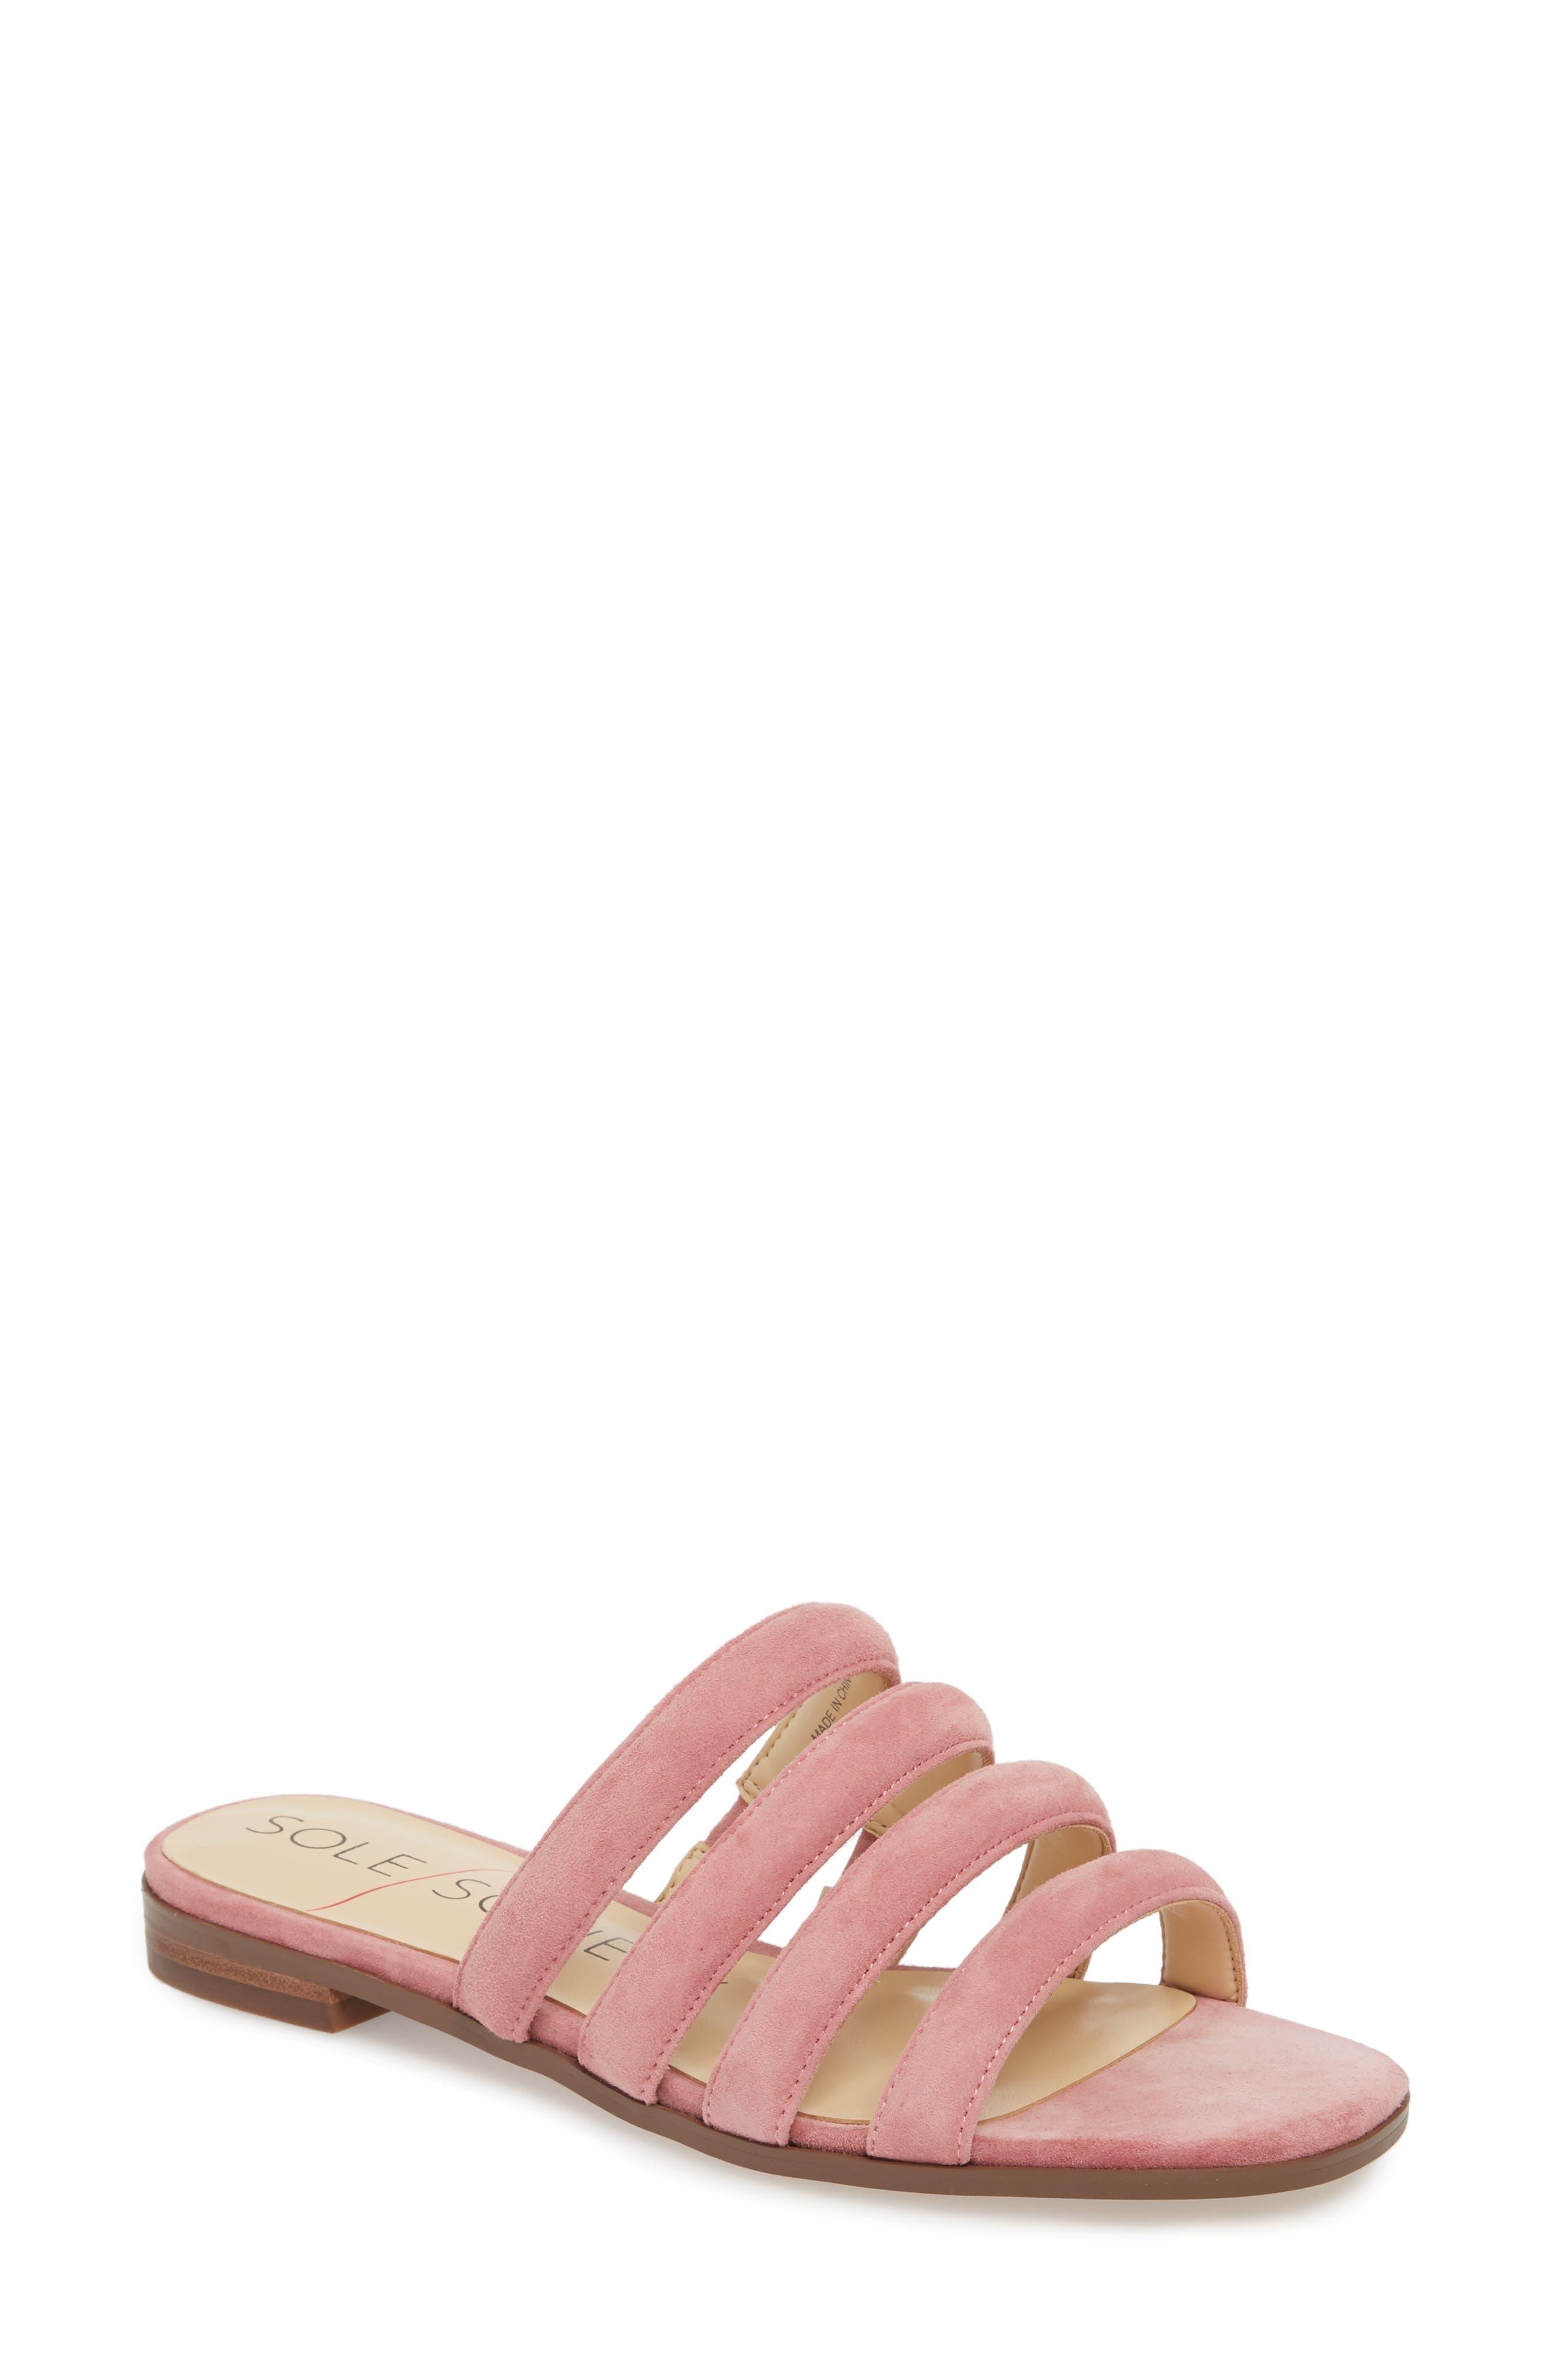 Saxten Strappy Slide Sandal,                         Main,                         color, PRIMROSE